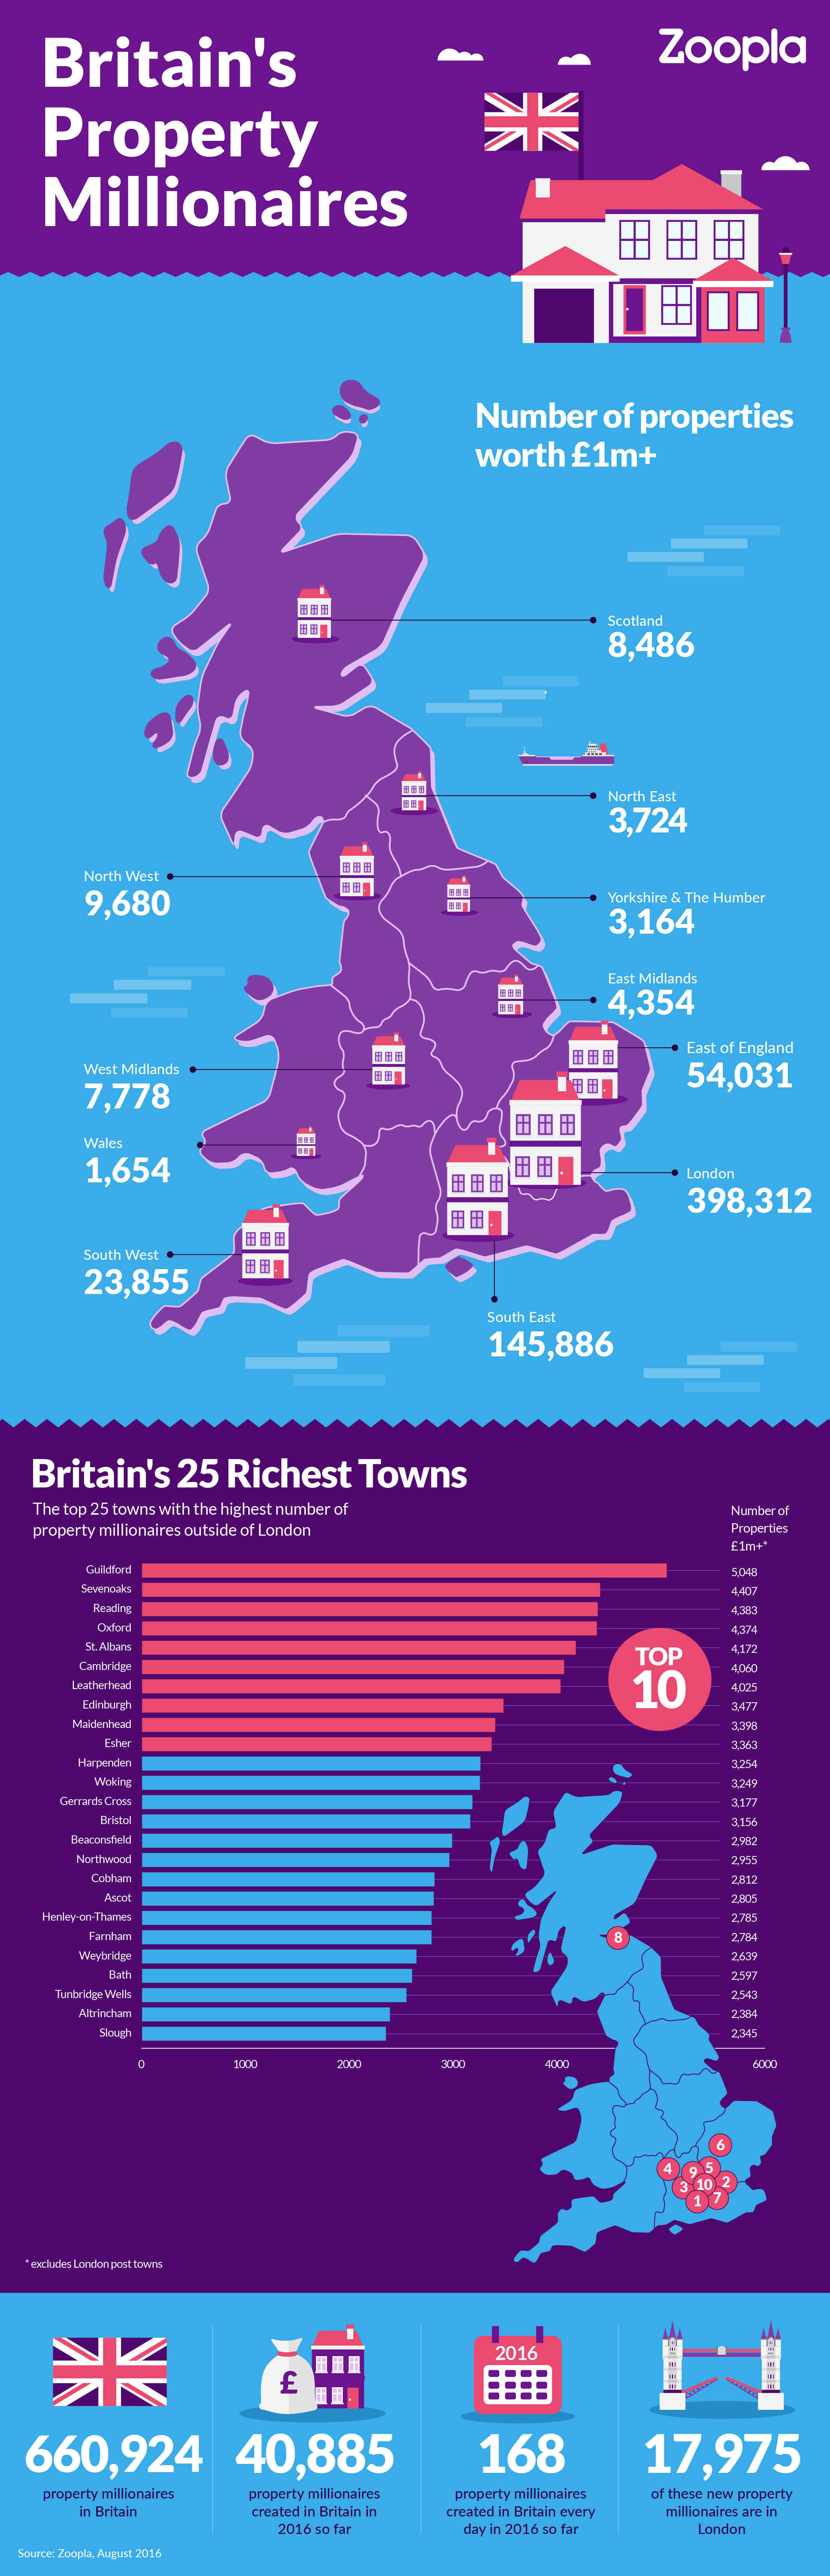 zoopla-britains-property-millionaires